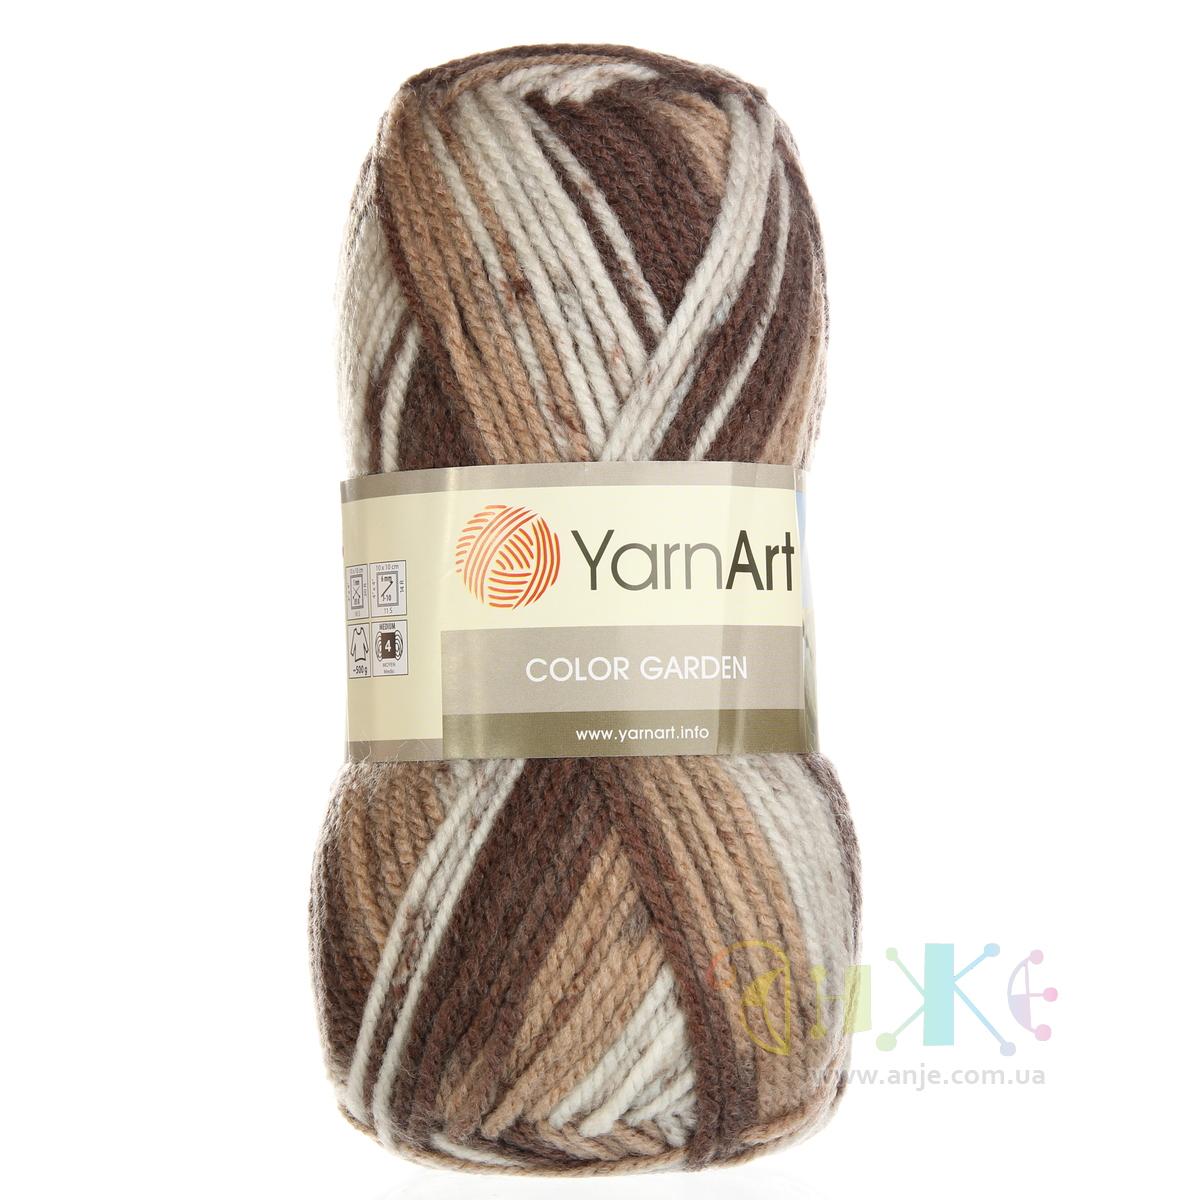 Yarn art color garden -  Yarnart Color Garden 45 A Href I C Good 91 60 91608211_download Jpg Style Float Right A